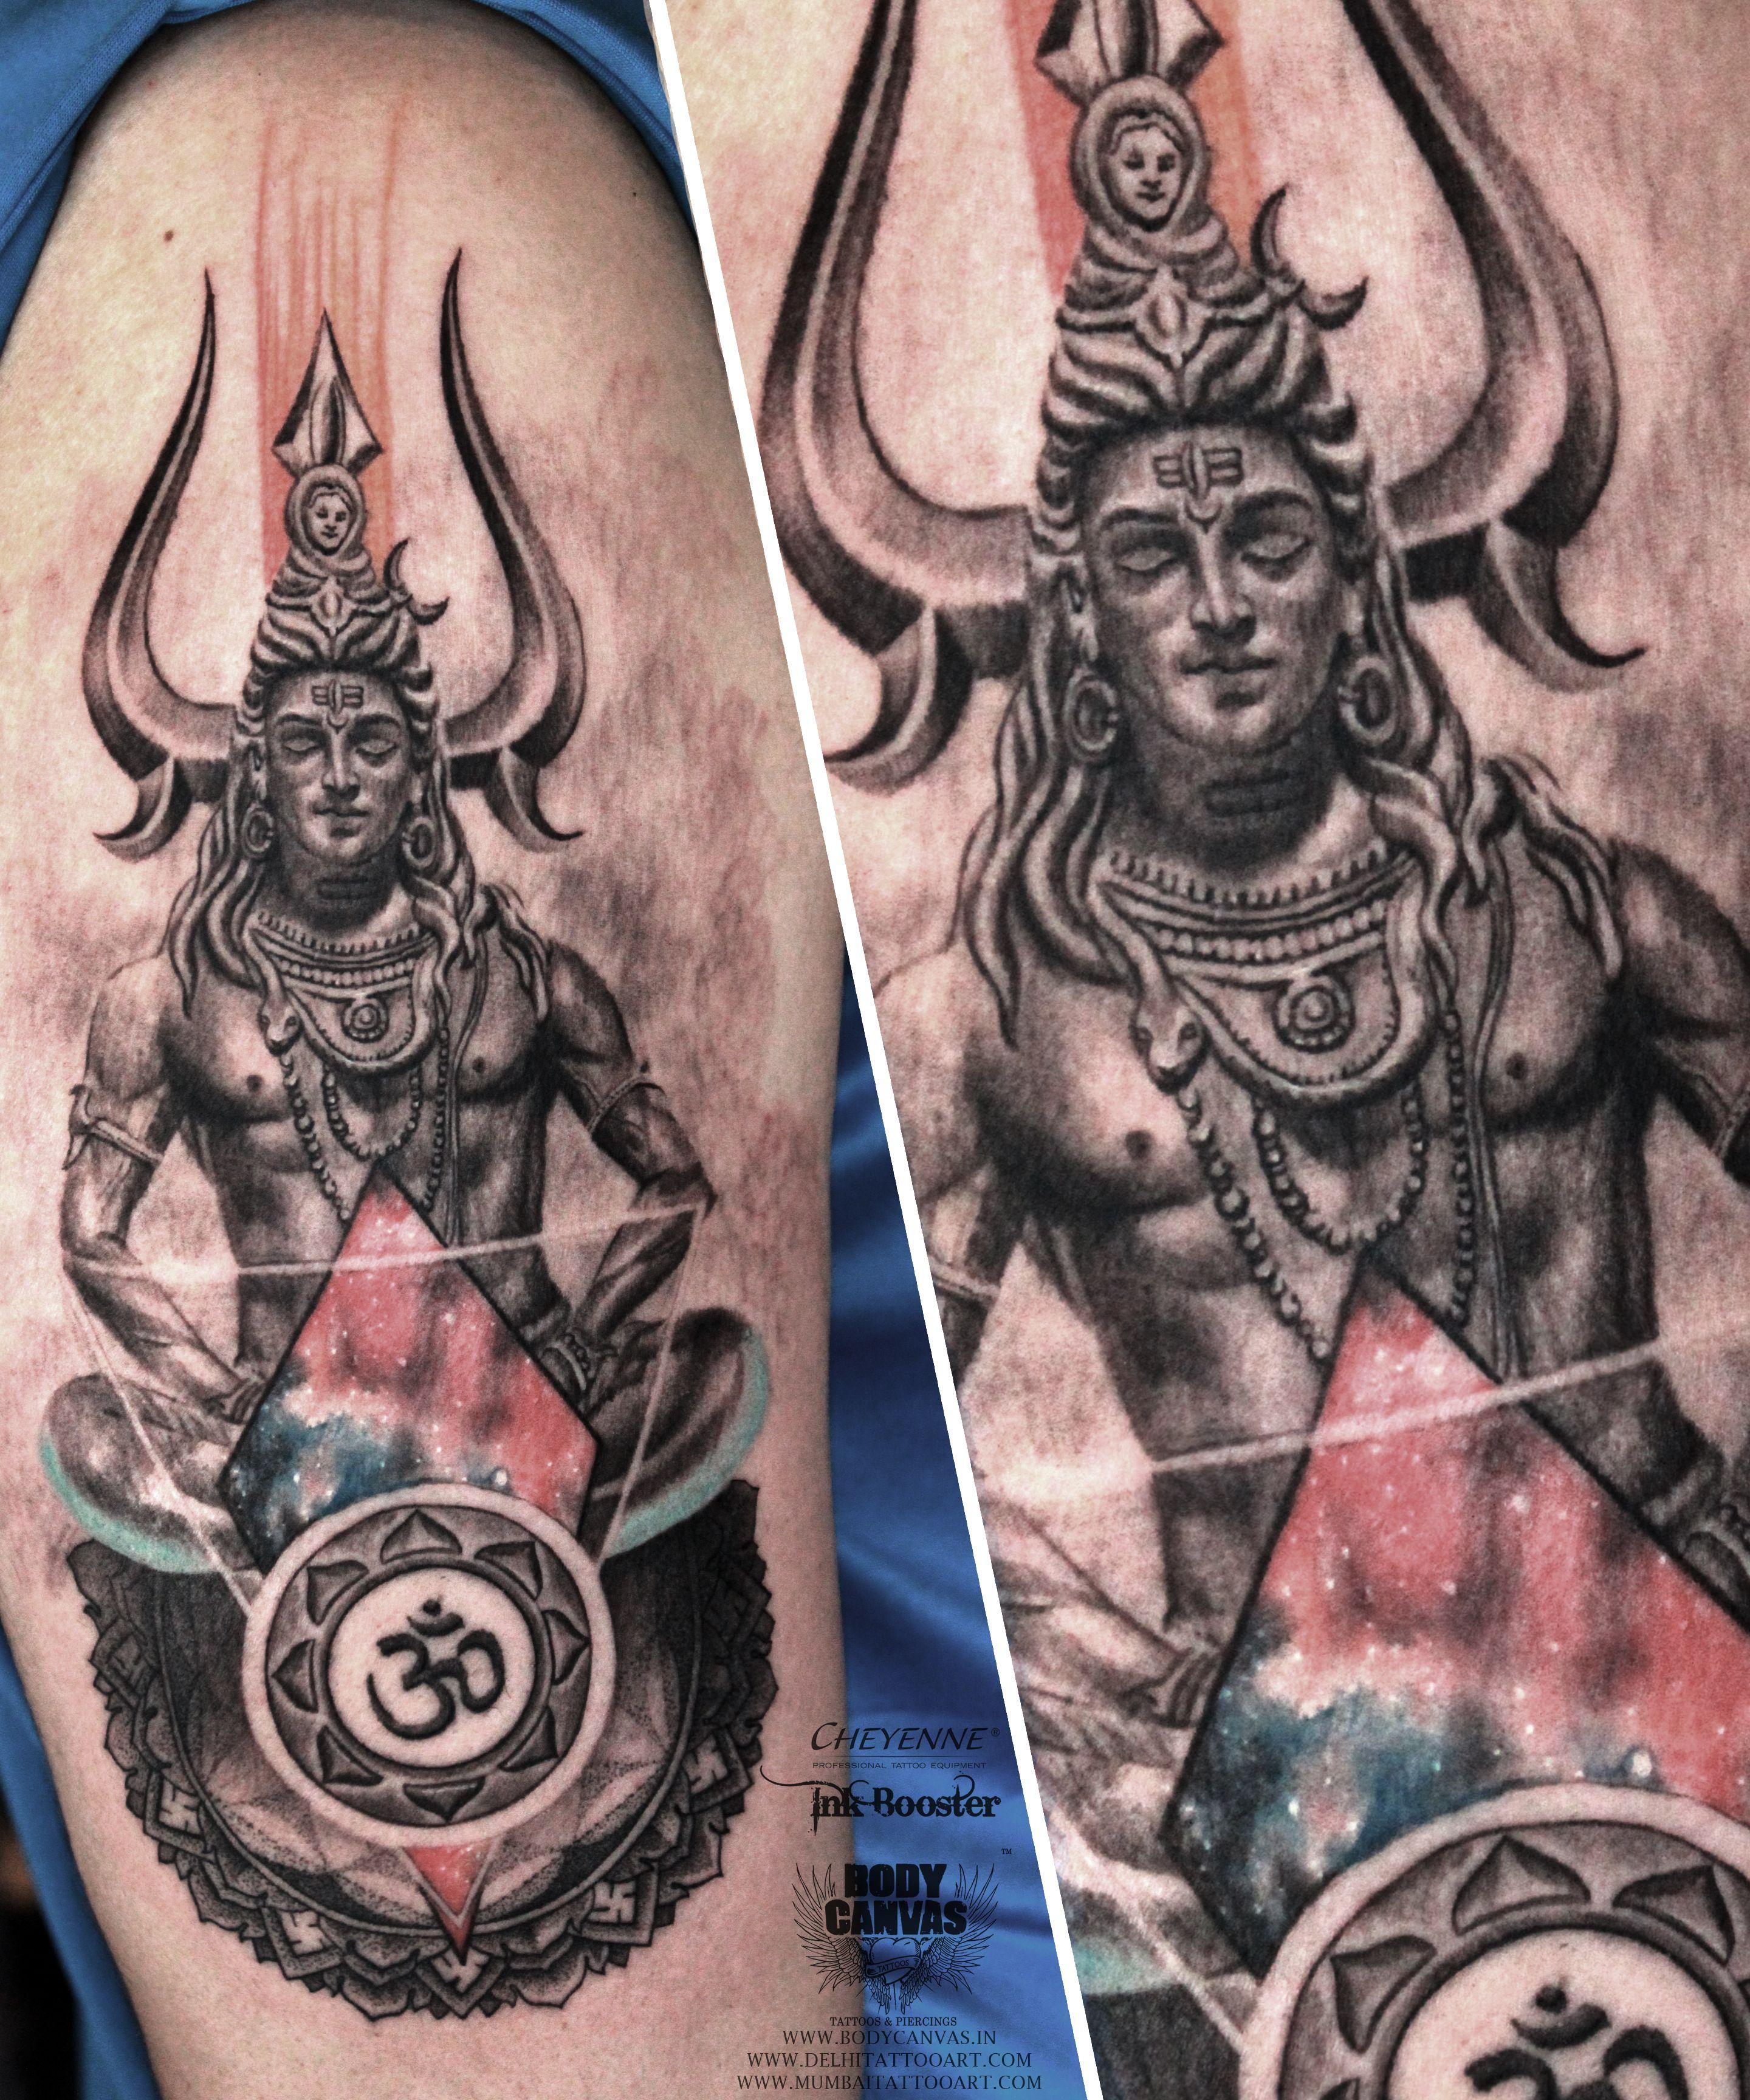 Om Tattoo Shiva Meditating In 2020 Shiva Tattoo Design Trishul Tattoo Designs Shiva Tattoo